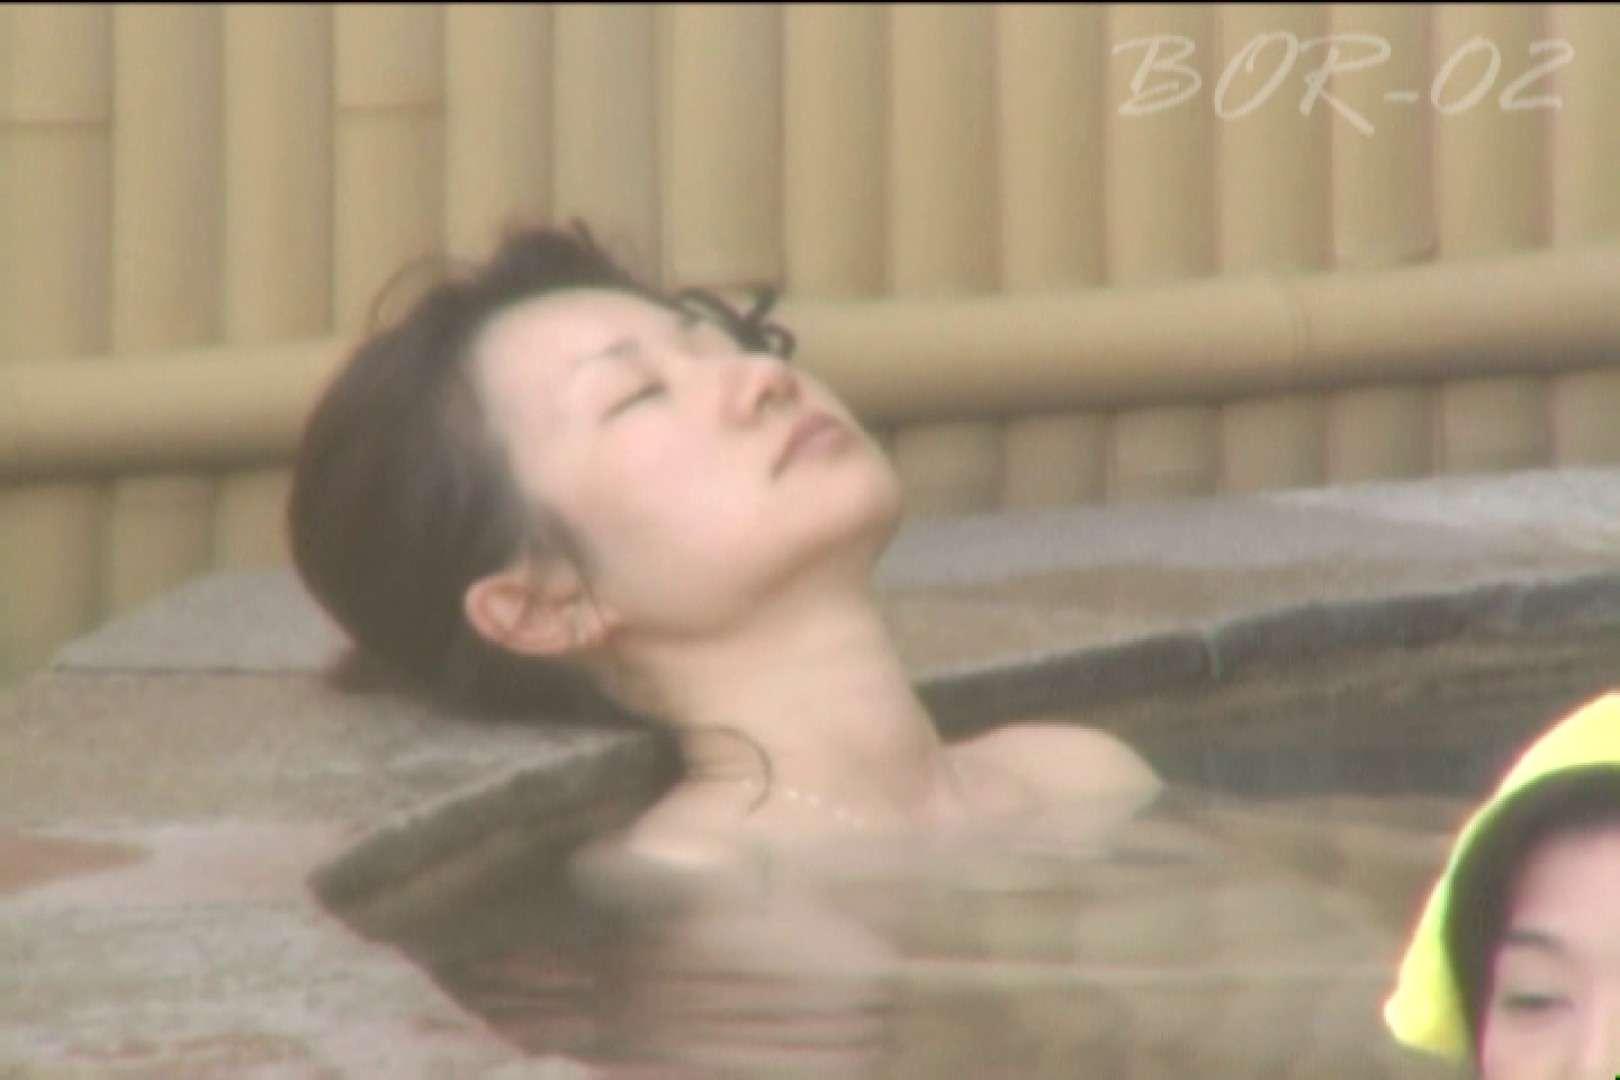 Aquaな露天風呂Vol.477 盗撮シリーズ | 露天風呂編  104PIX 37